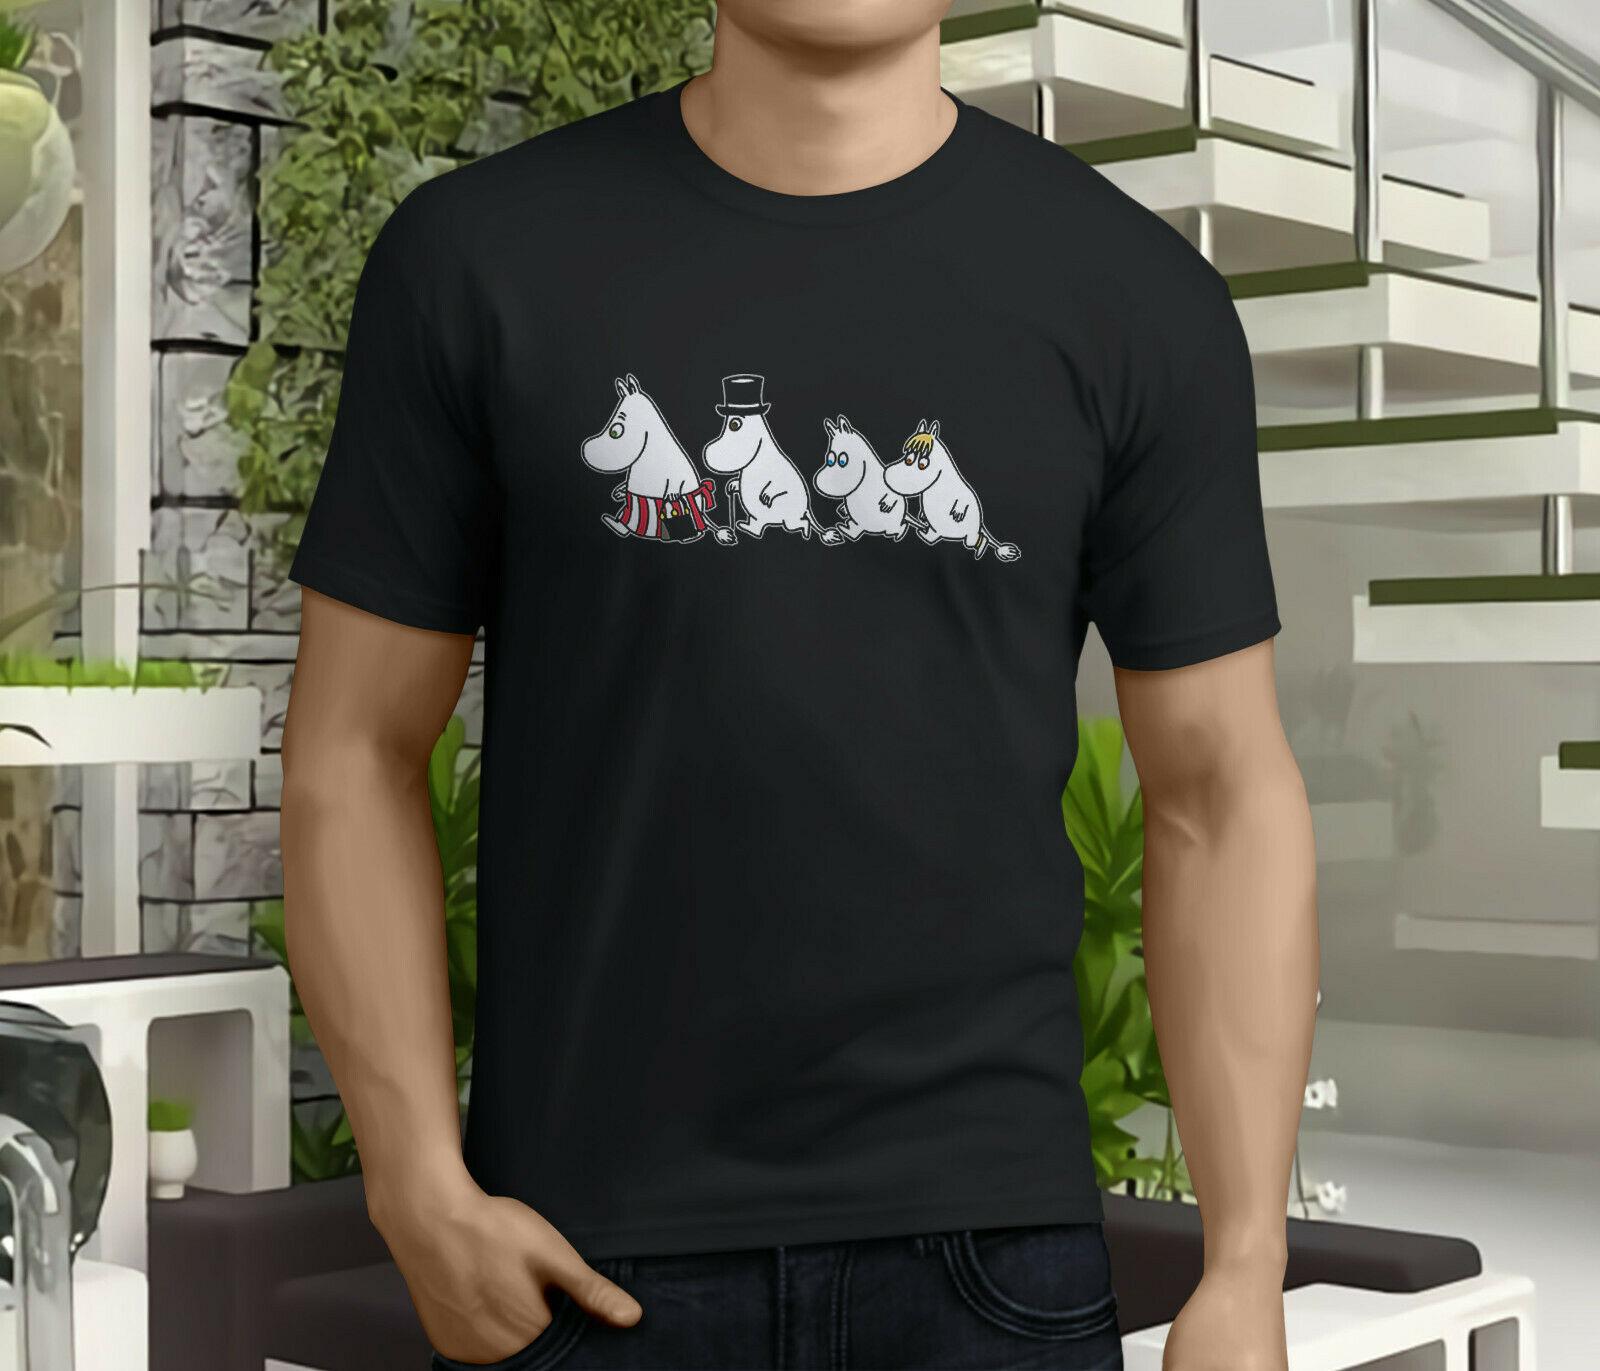 Novo popular moomin família mumin snufkin snorkmaid masculino preto t camisa tamanho s 3xl